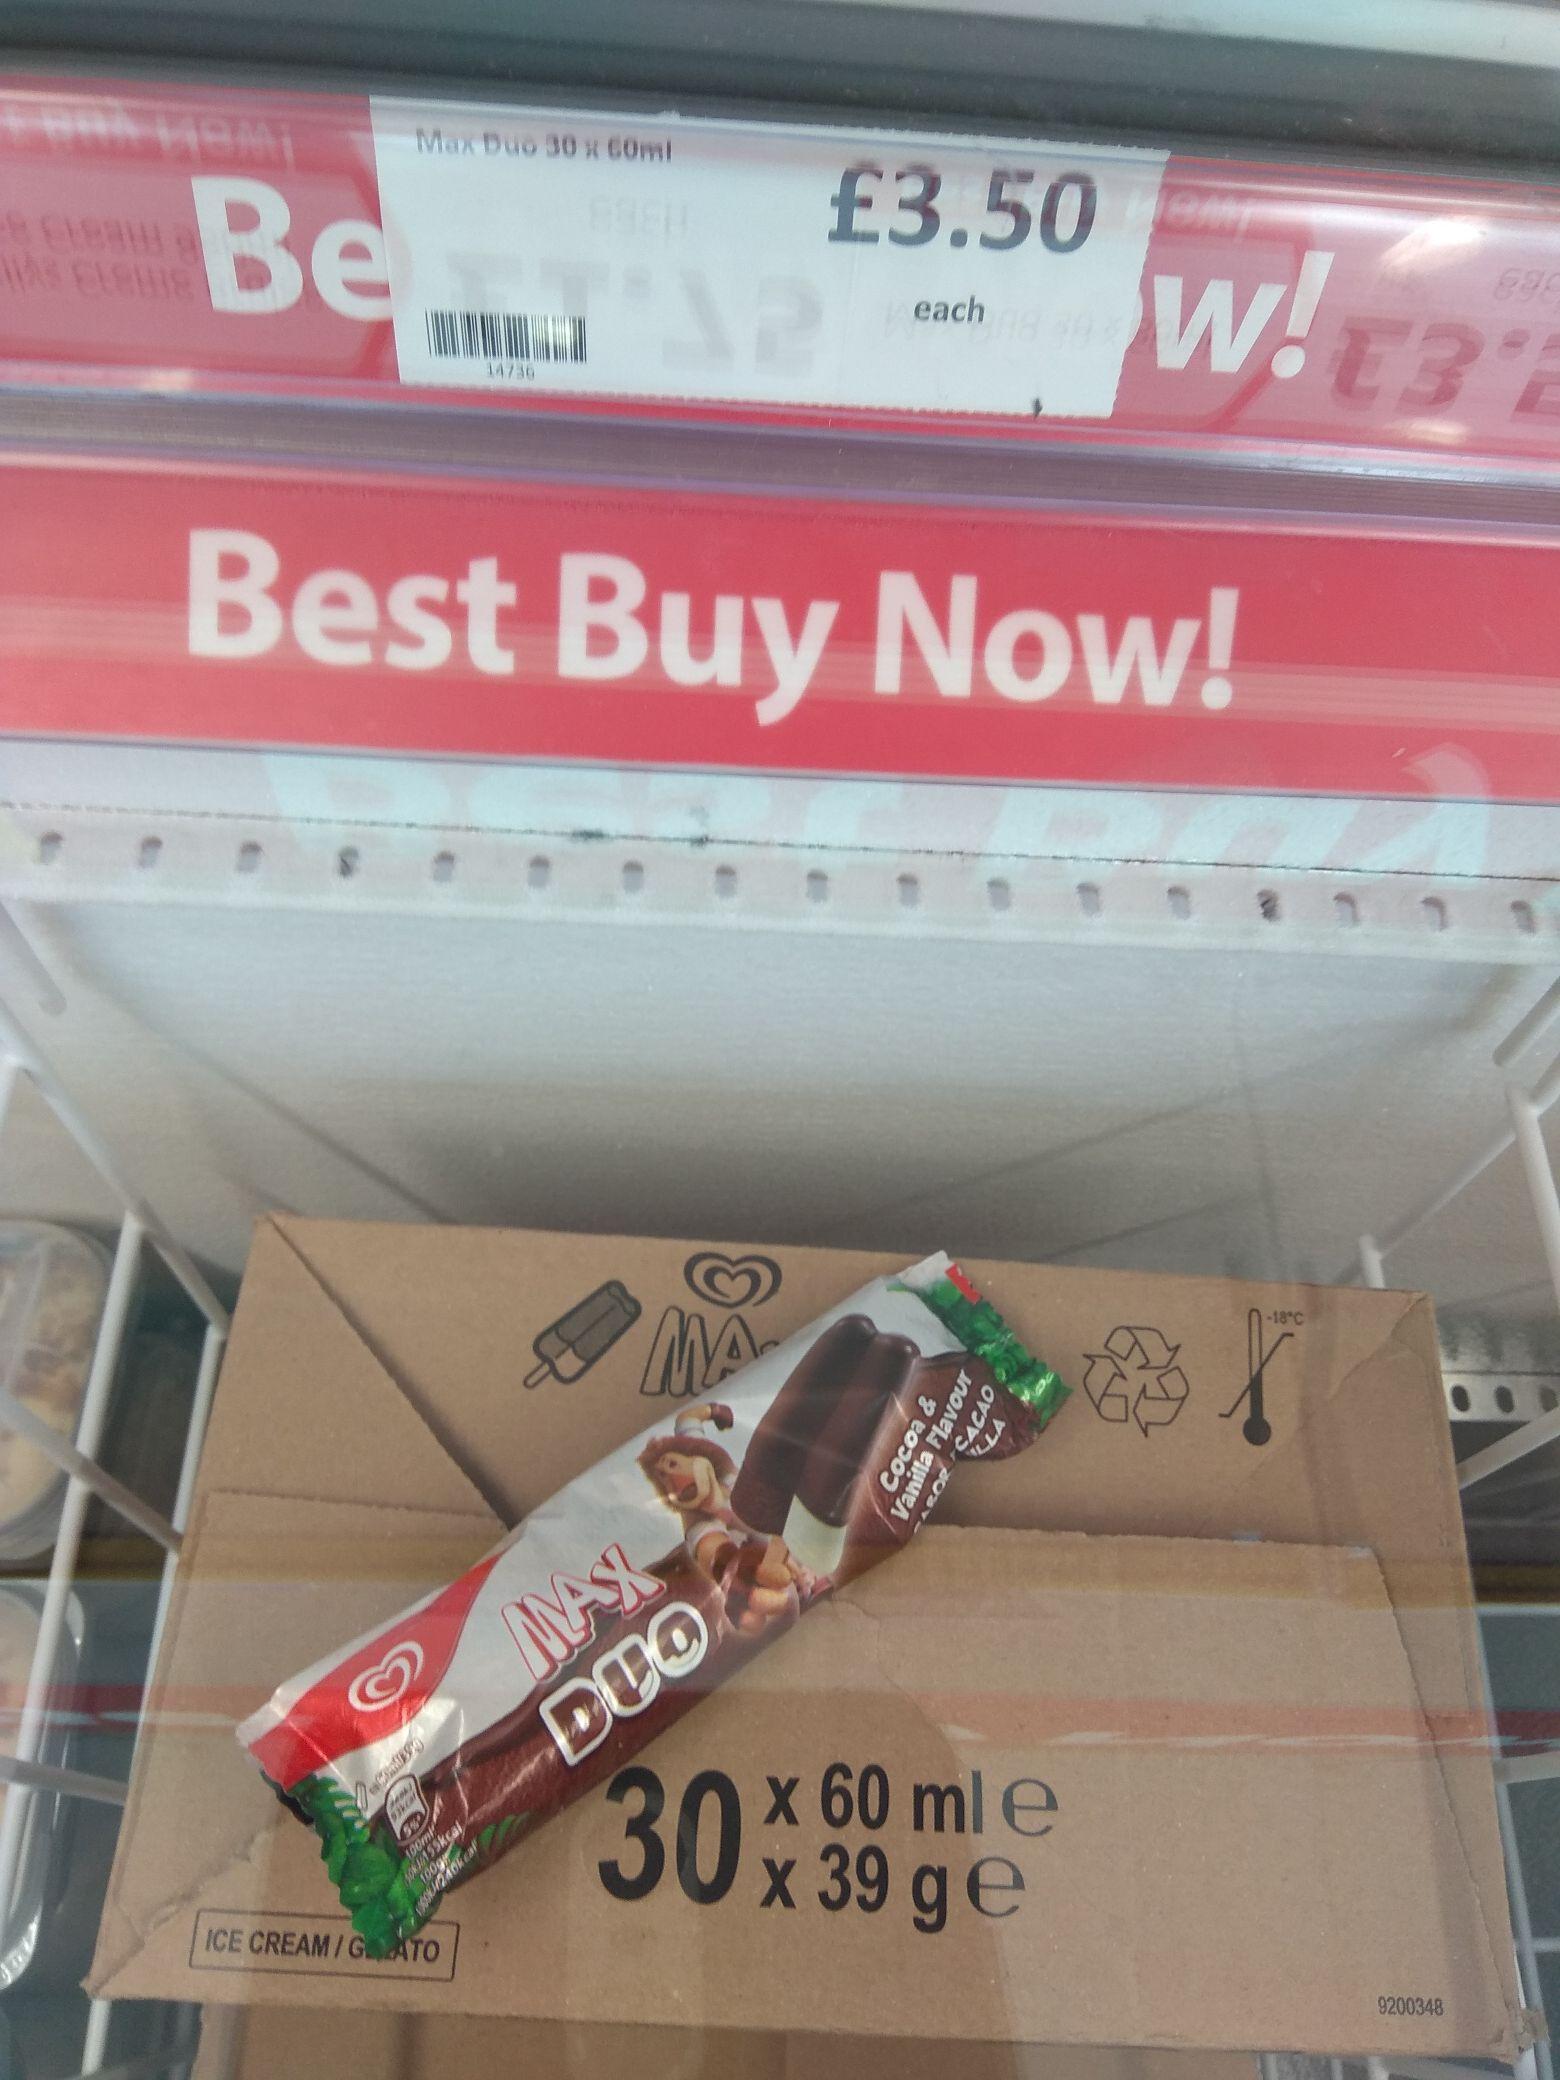 30 x Walls Max Duo Cocoa & Vanilla ice creams 60ml - £3.50 @ Heron Foods